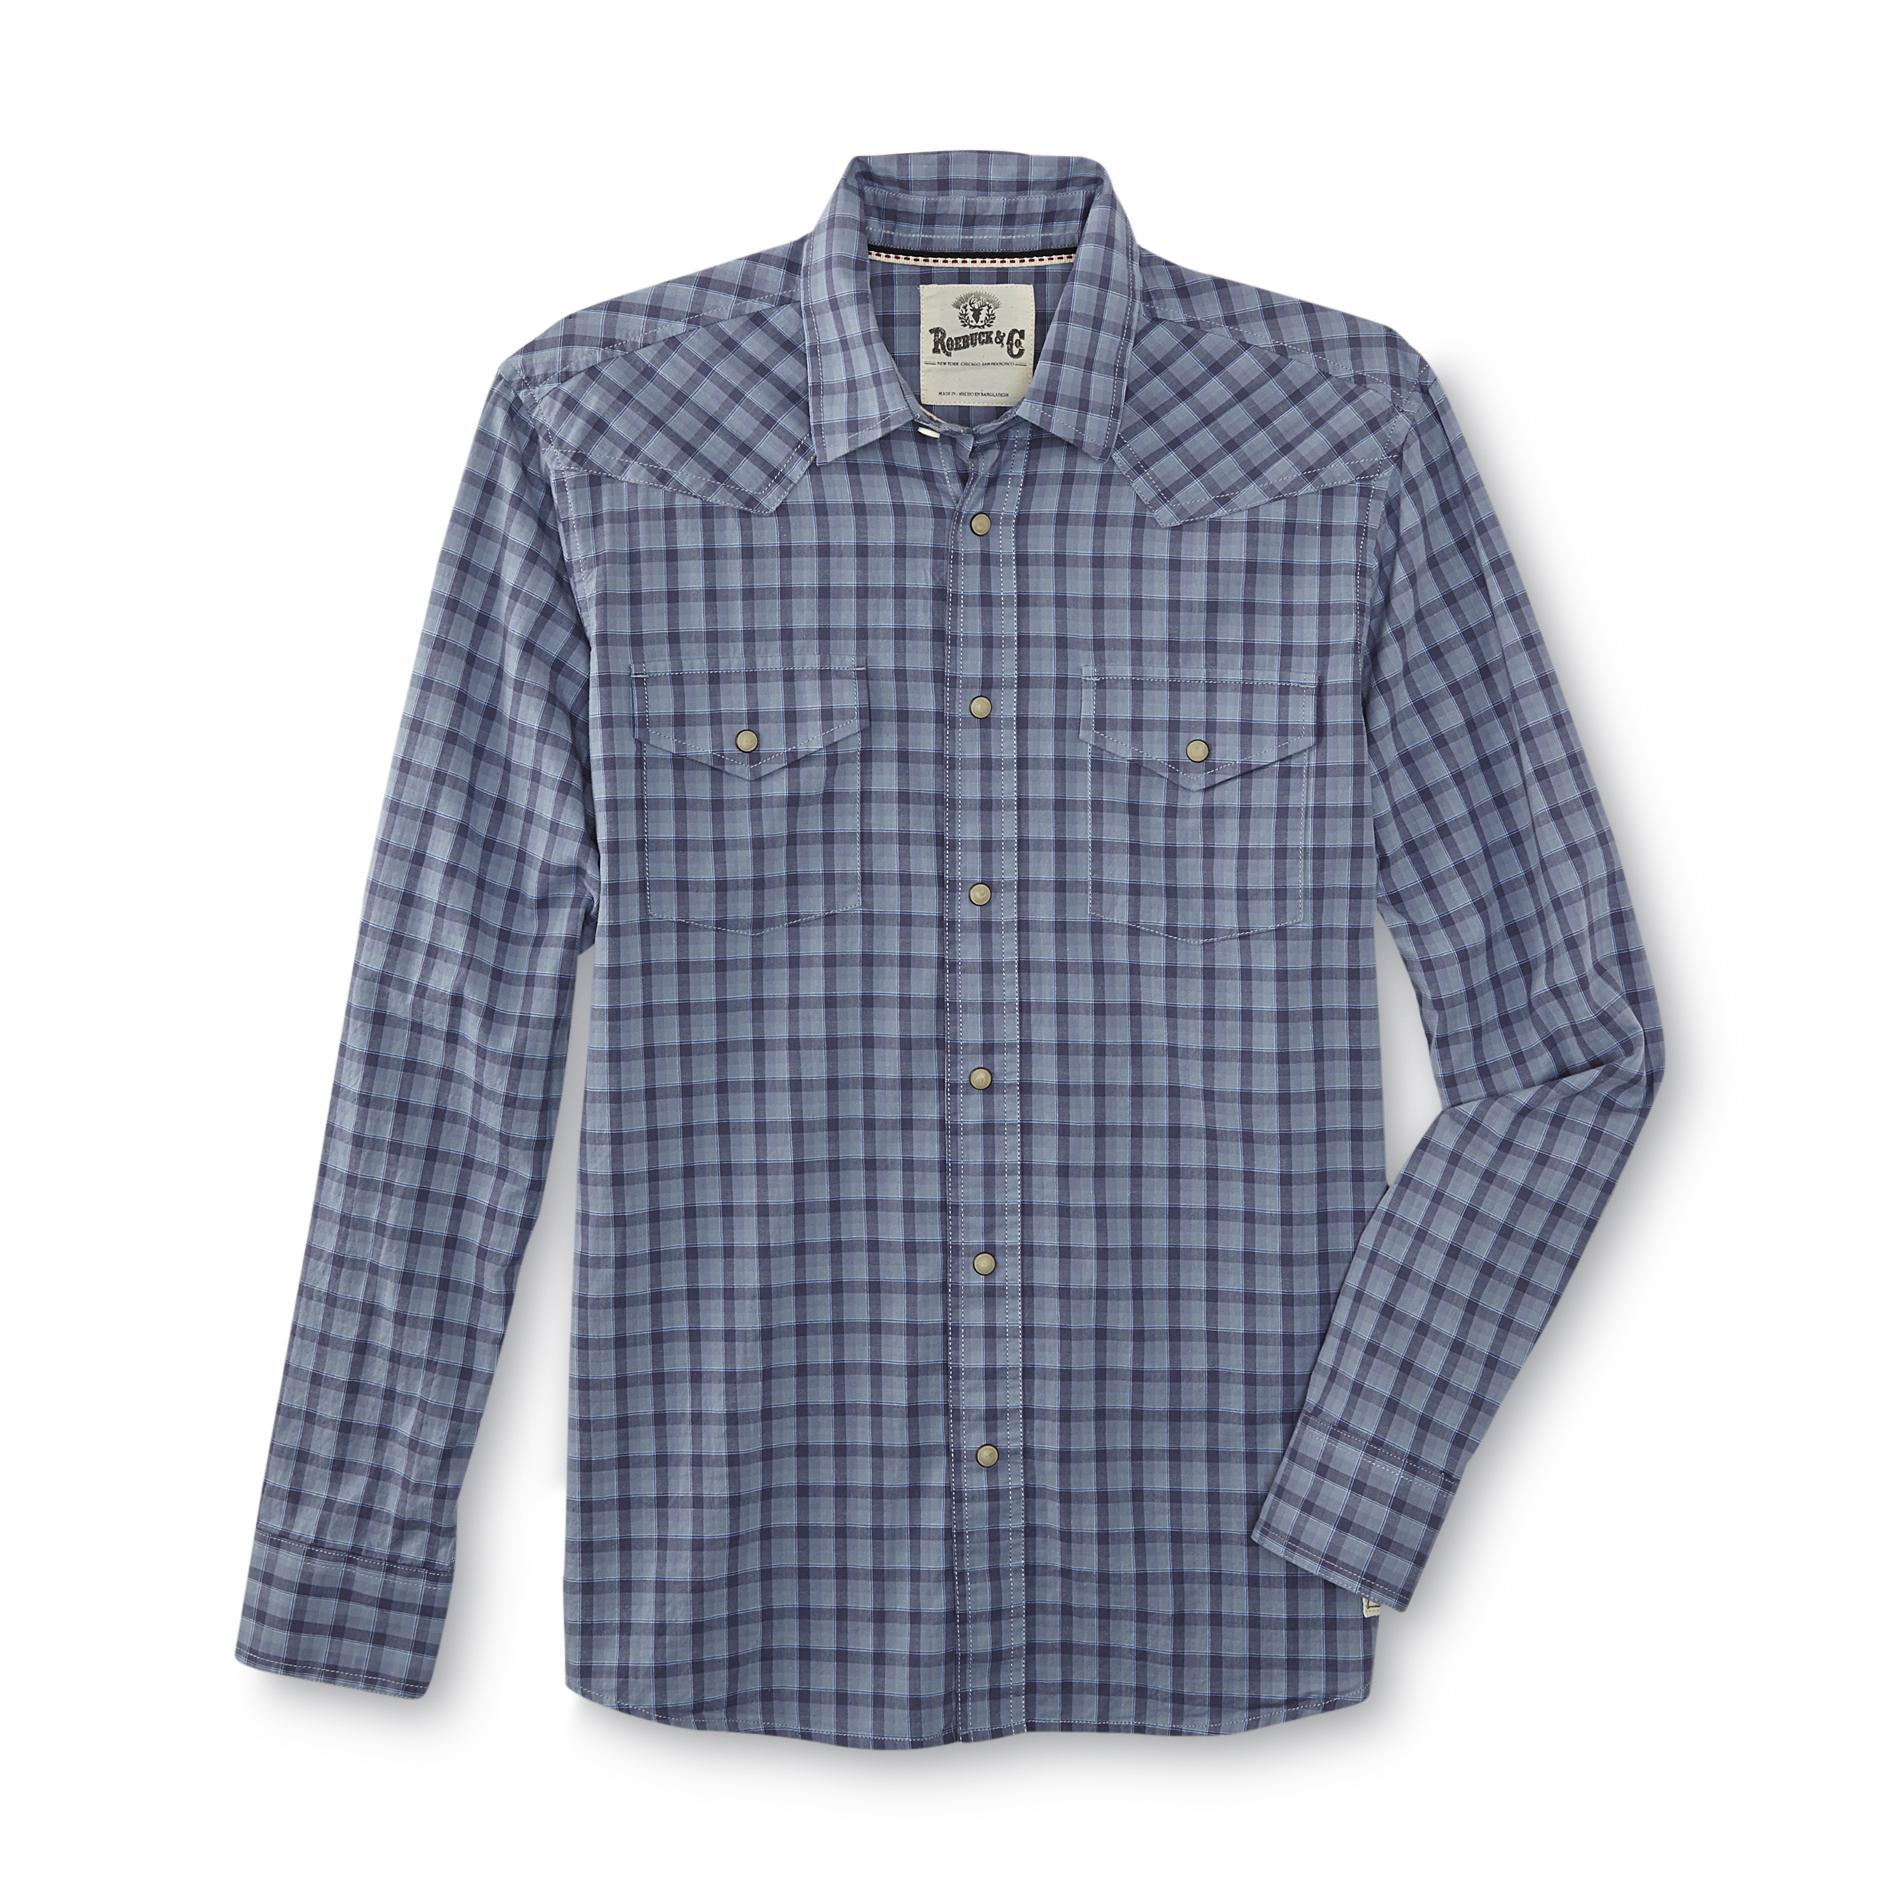 Roebuck & Co. Young Men's Western Shirt - Plaid